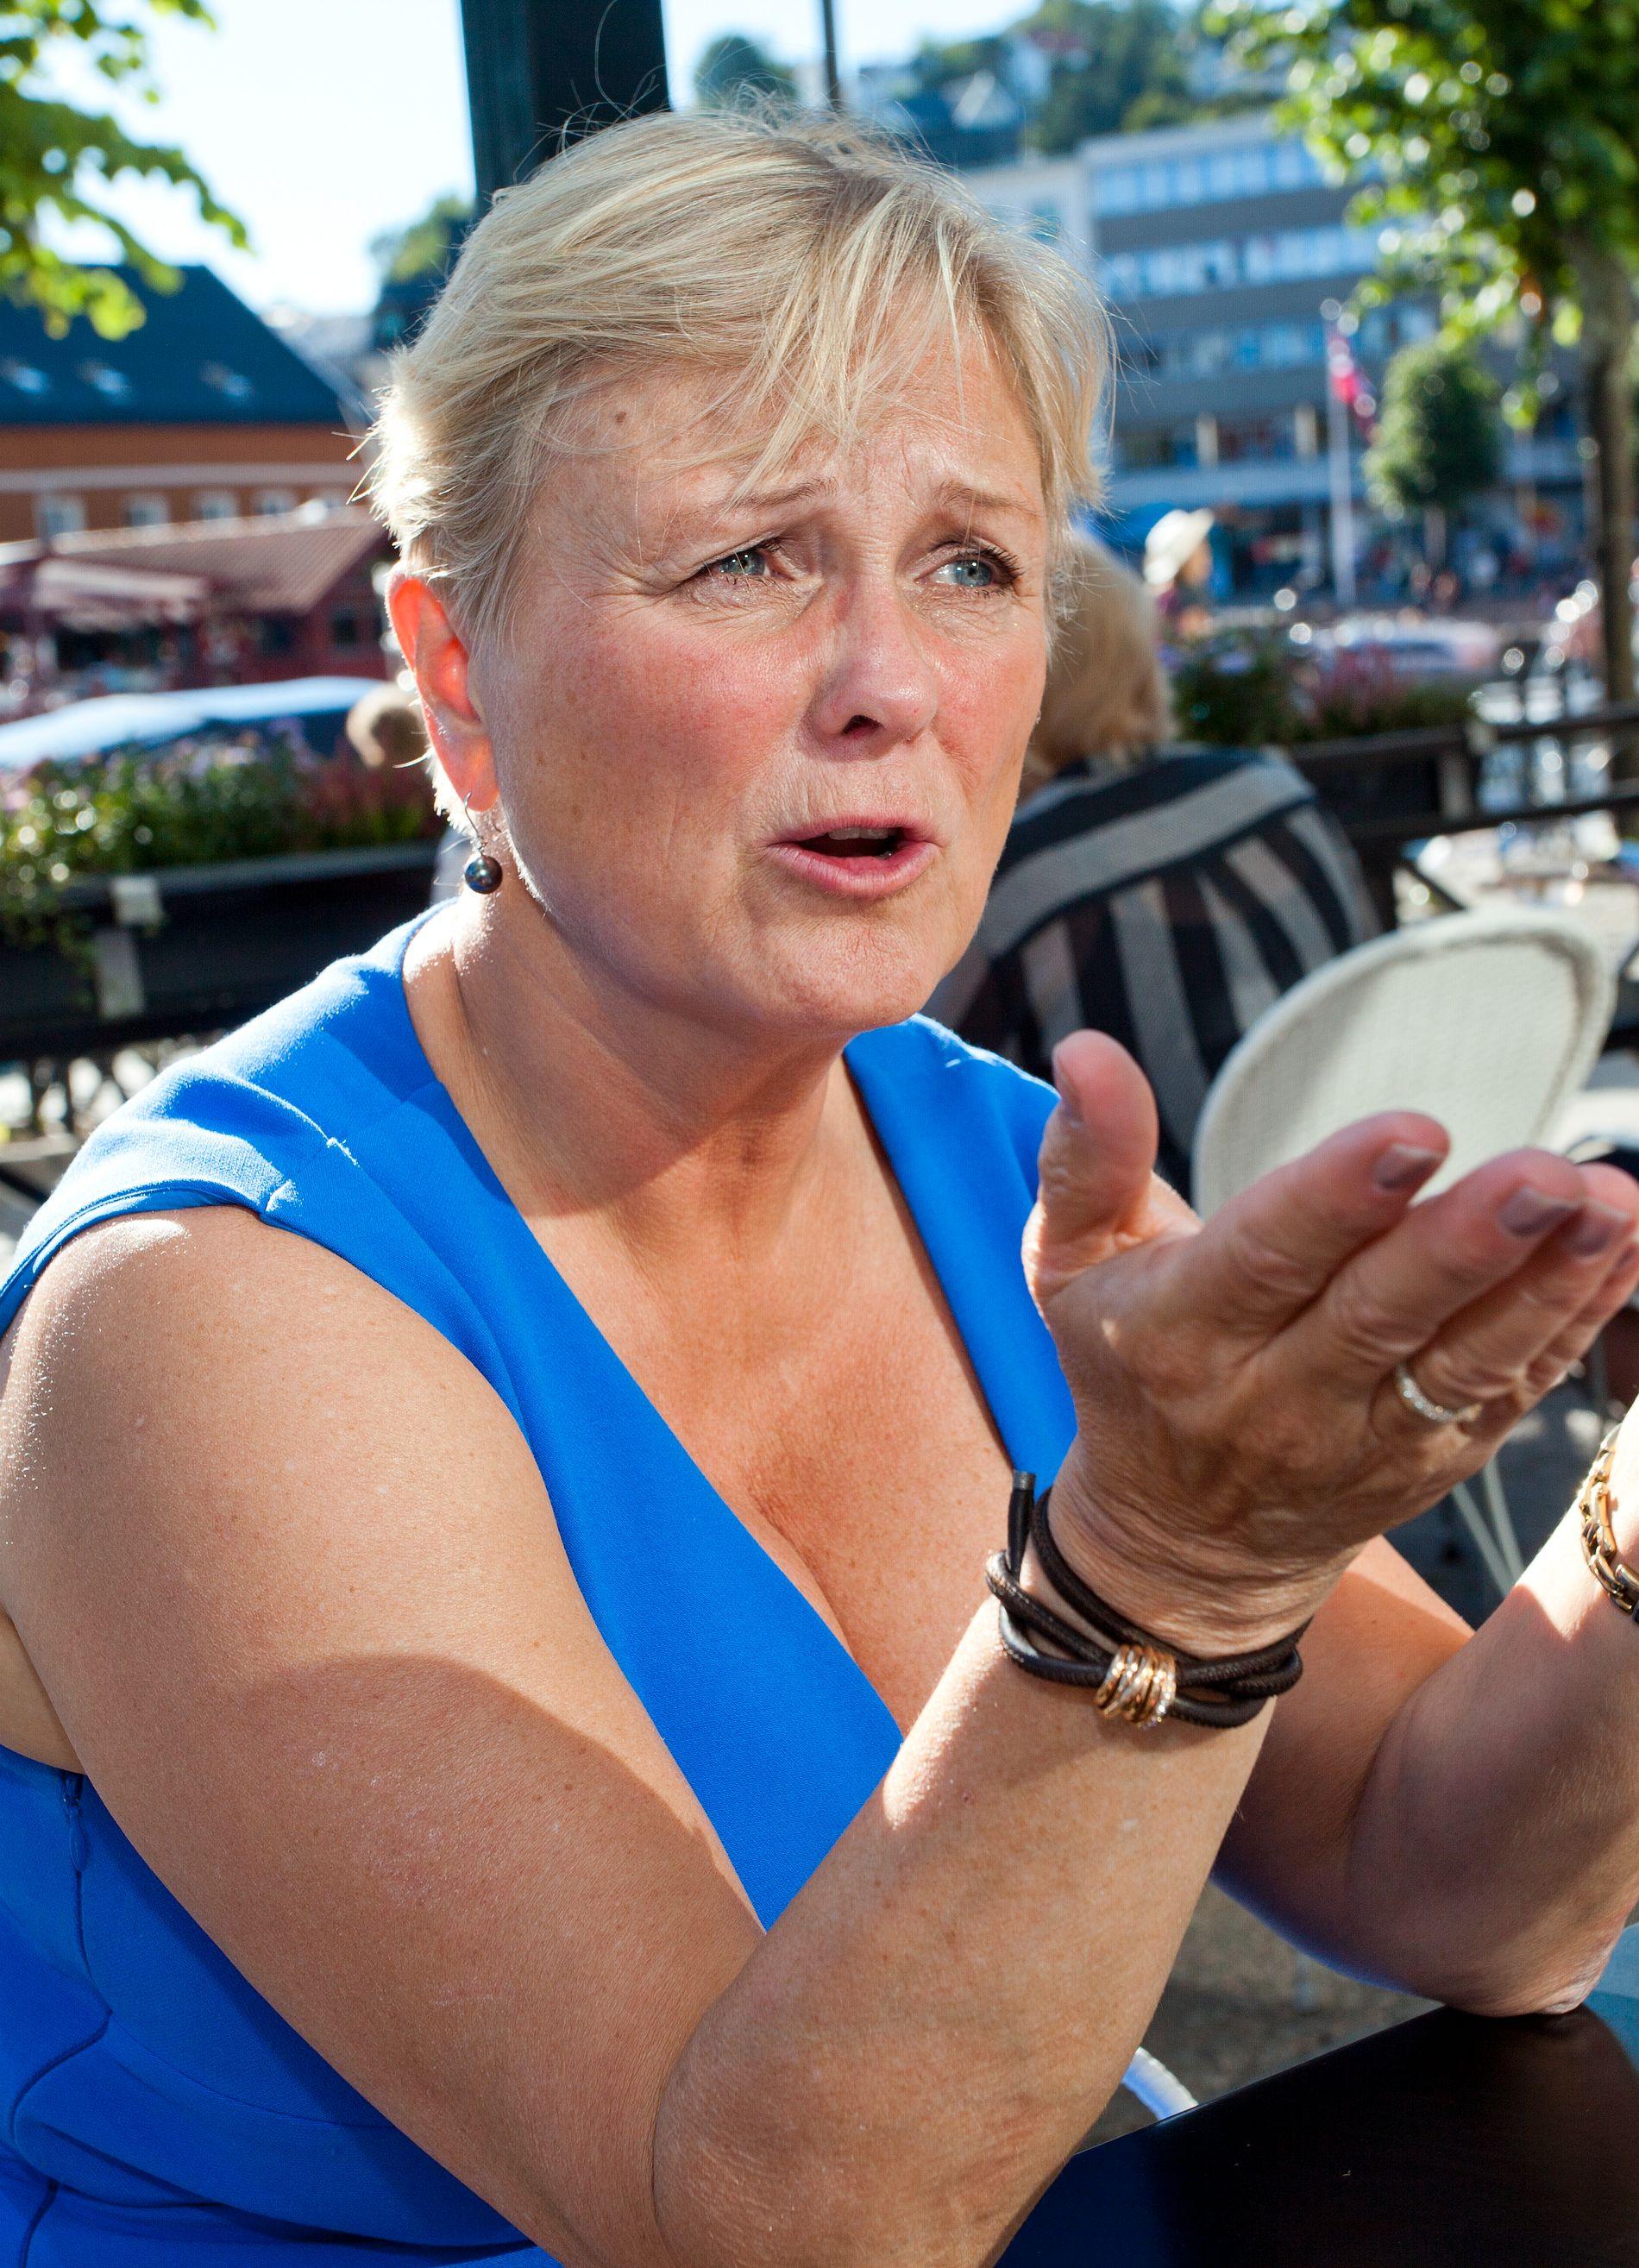 I STYRET: Thorild Widvey sitter i WADA-styret. Her under Arendalsuka i 2015.